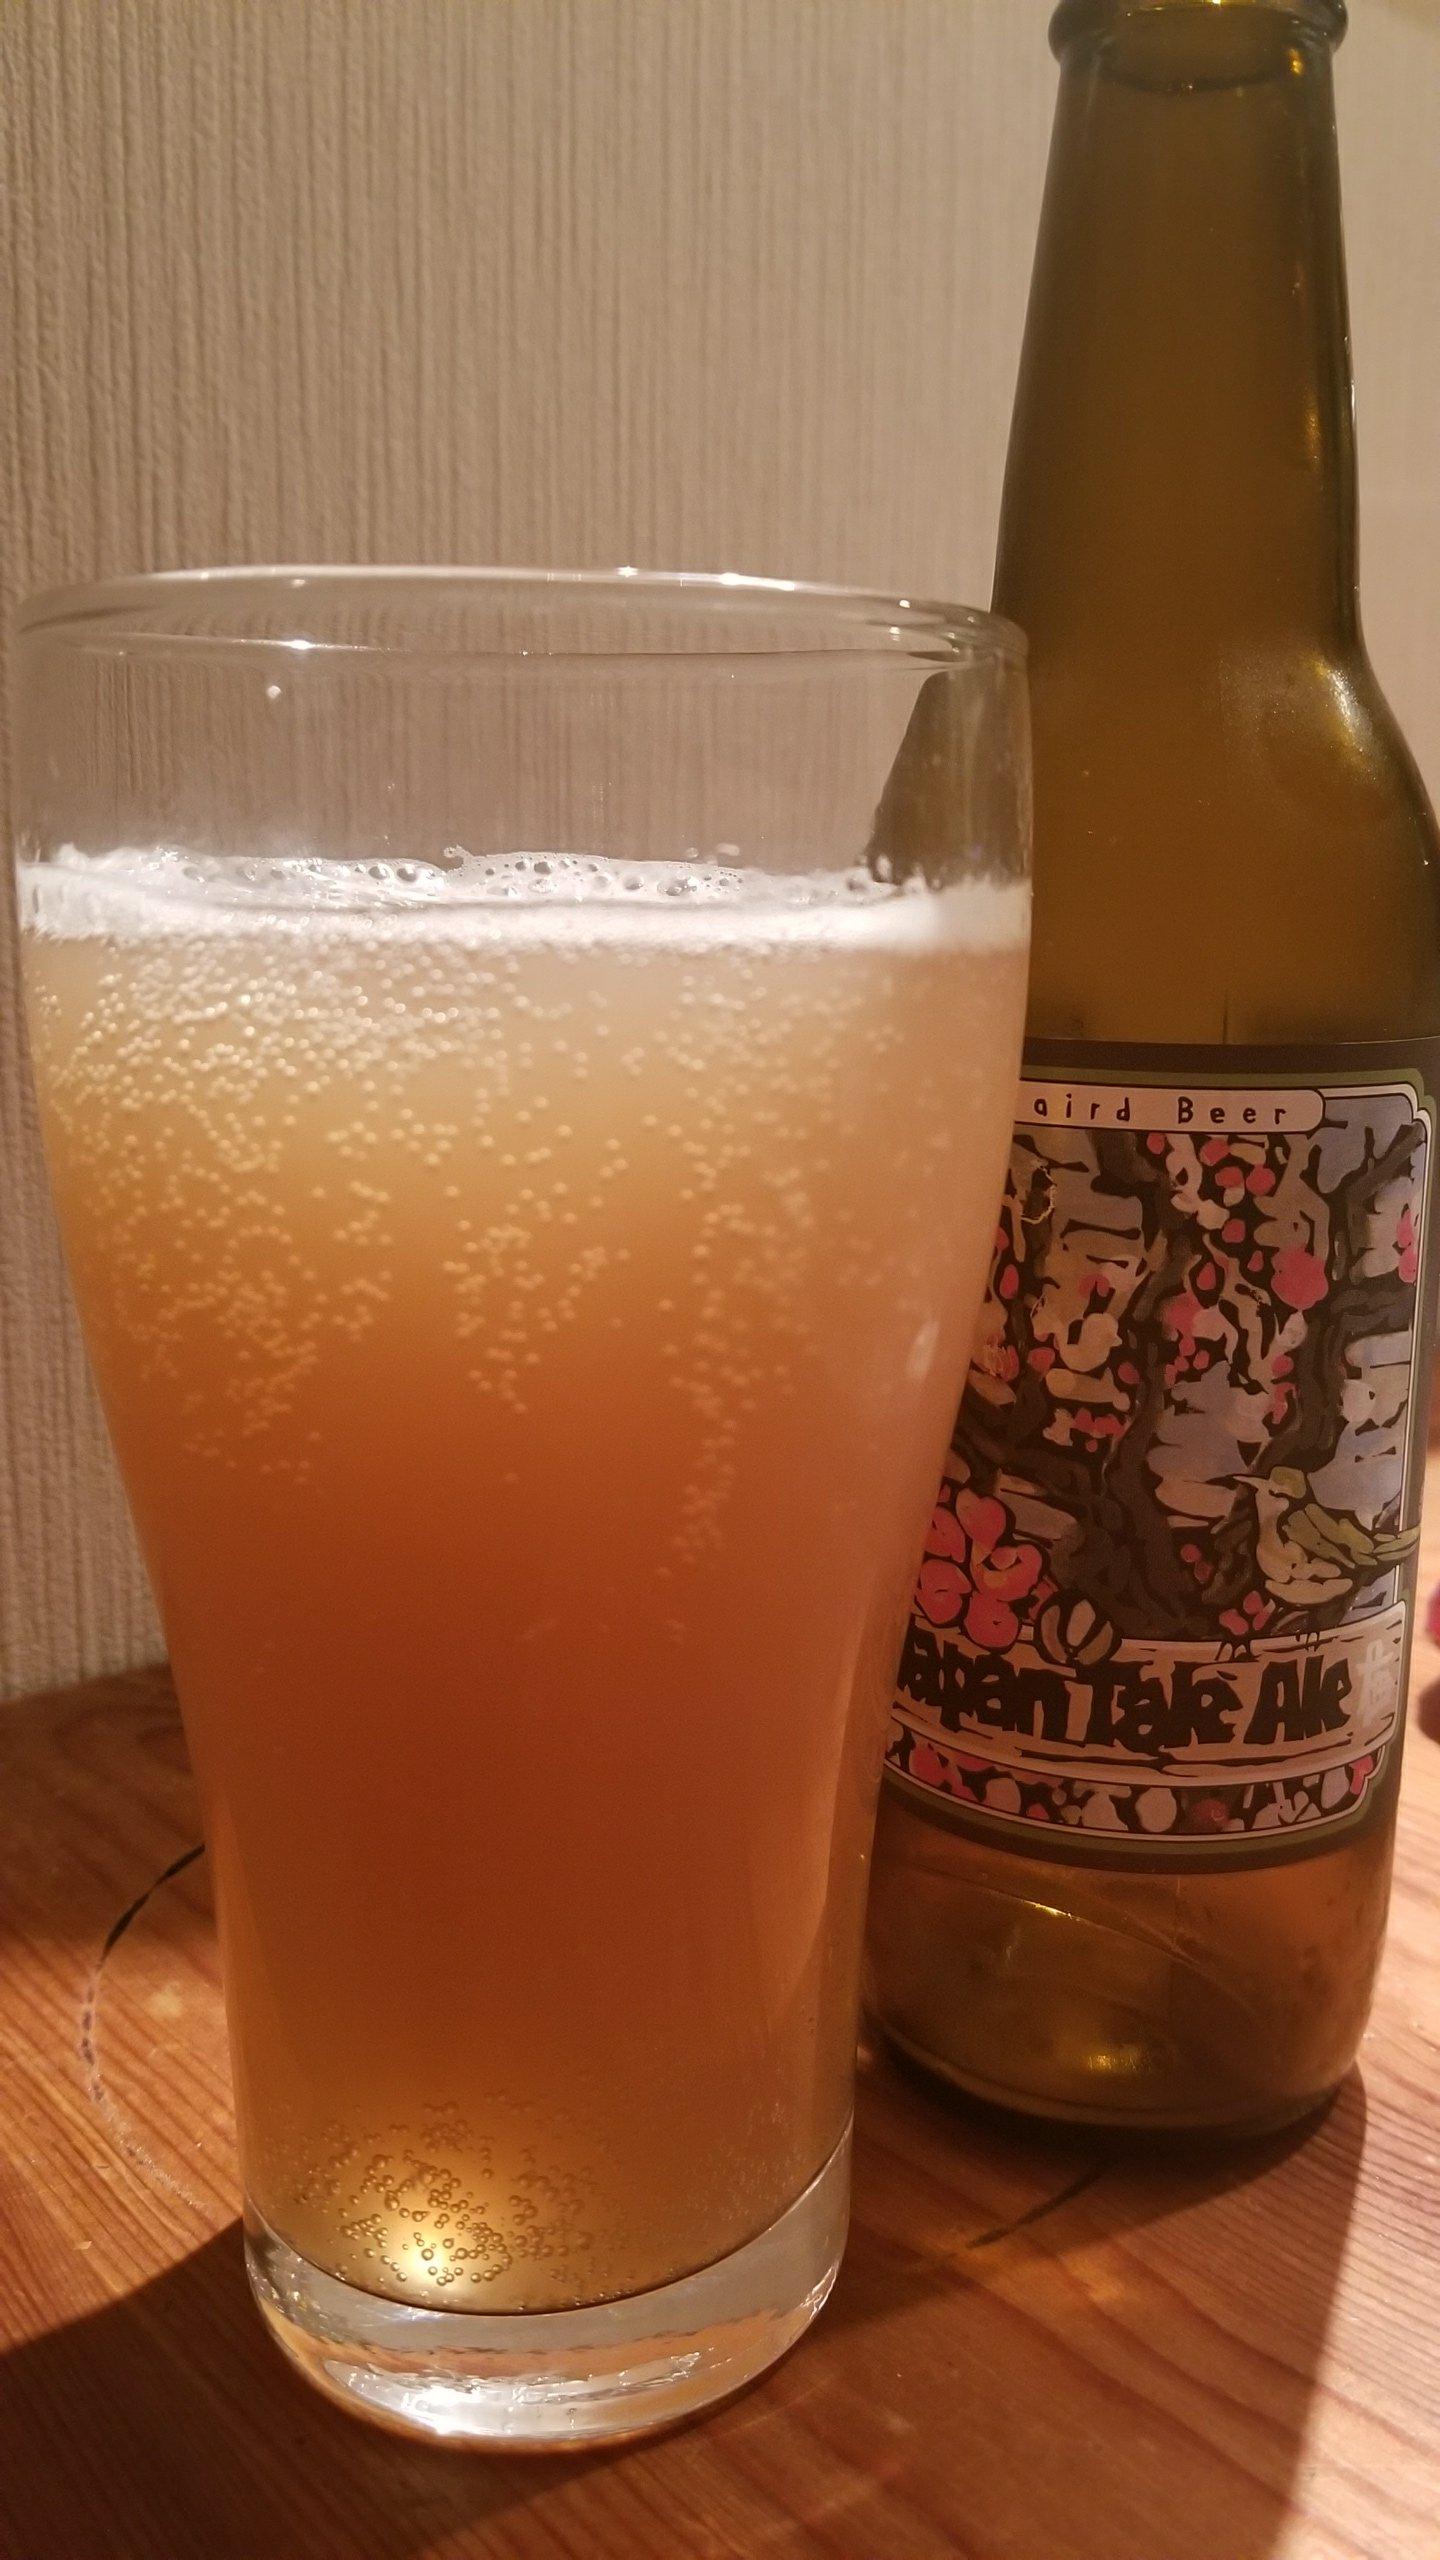 Baird Japan Tale Ale ベアード日本物語エール